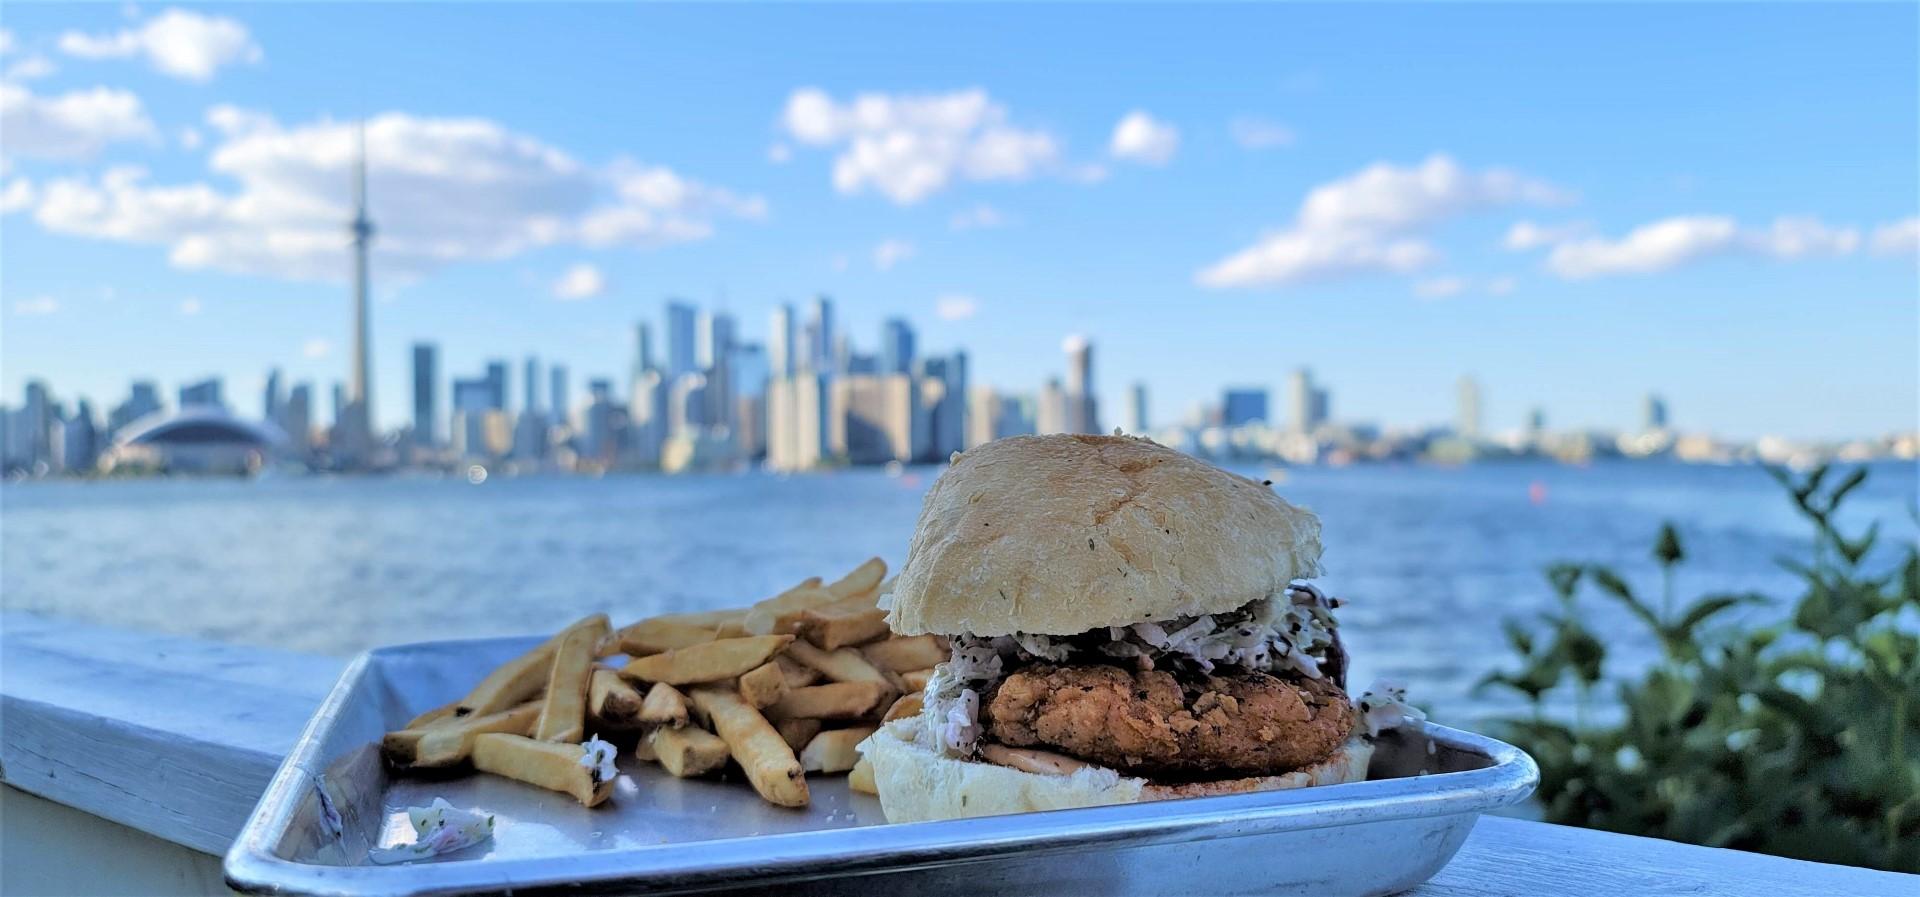 chicken sandwich with Toronto city views from Toronto Islands